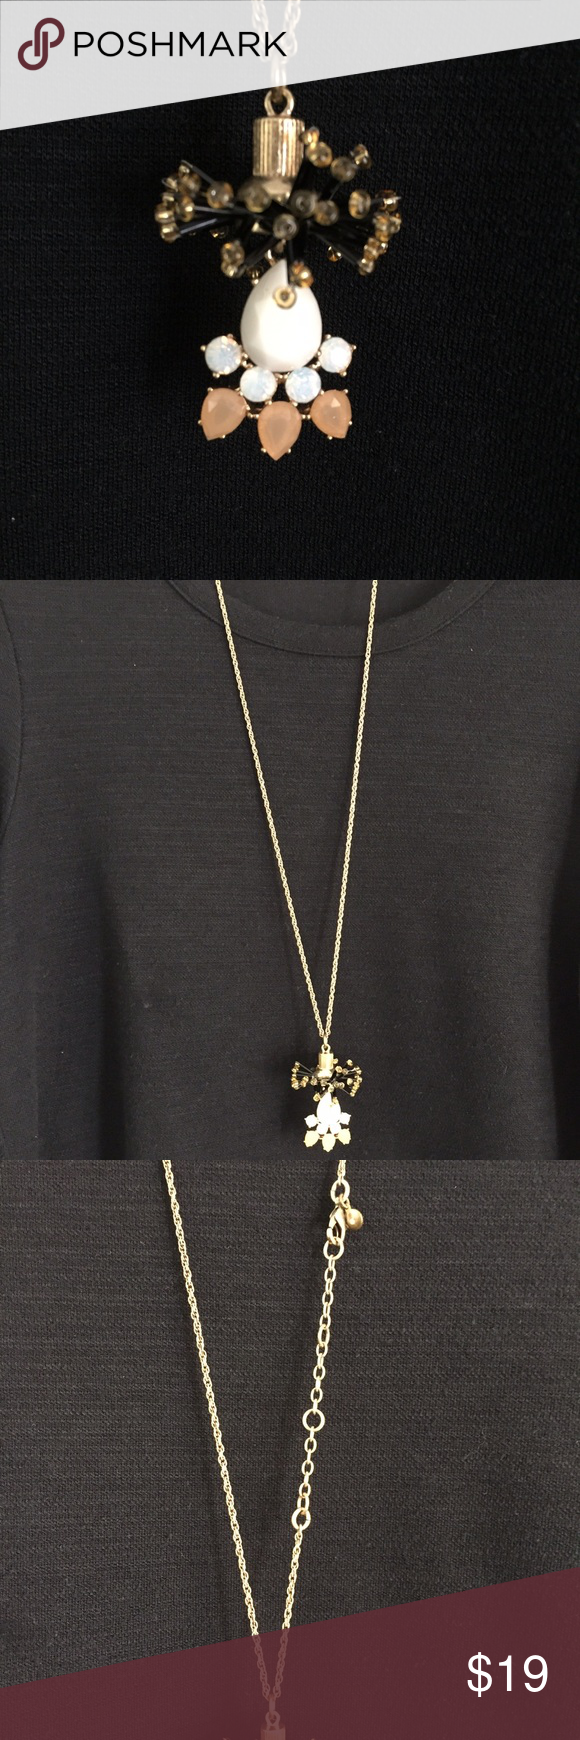 J crew pendant necklace beautiful stone pendant necklace from j crew